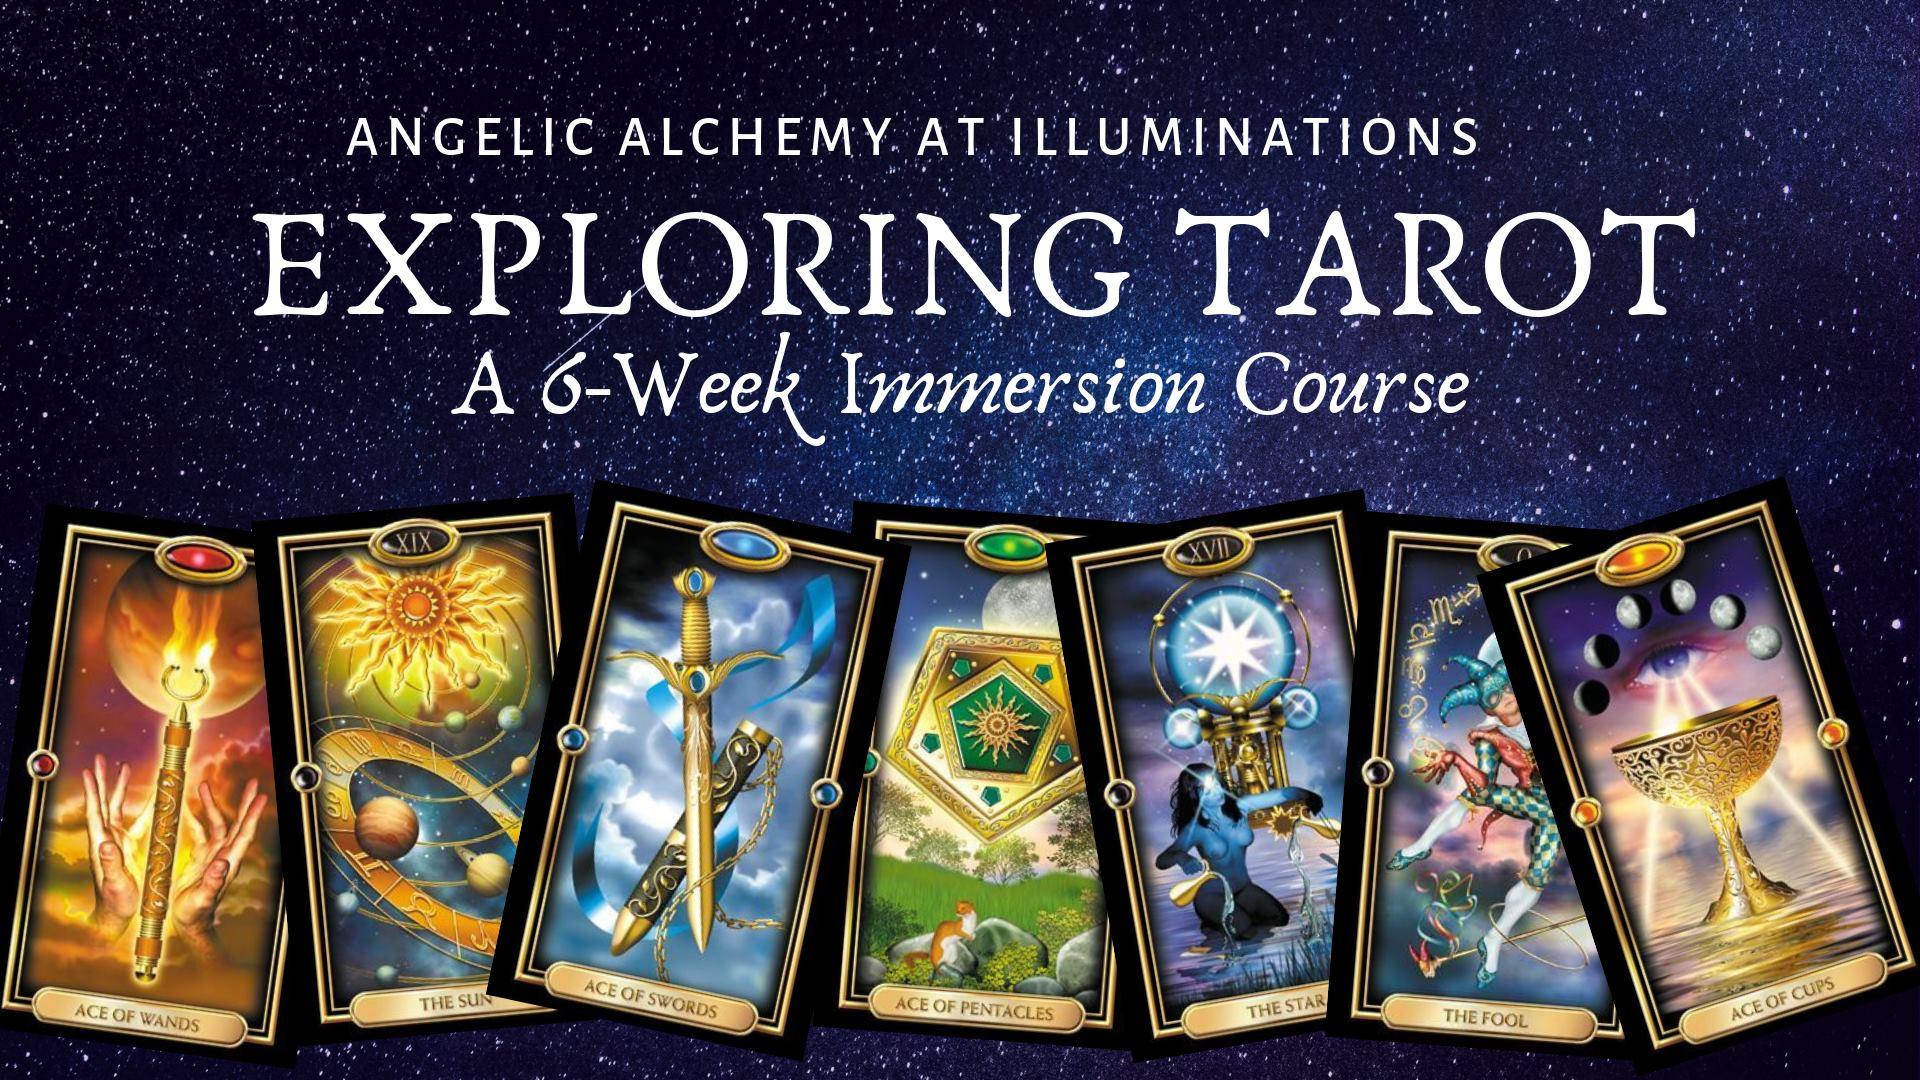 Exploring Tarot: A 6 Week Immersion Course - Illuminations!